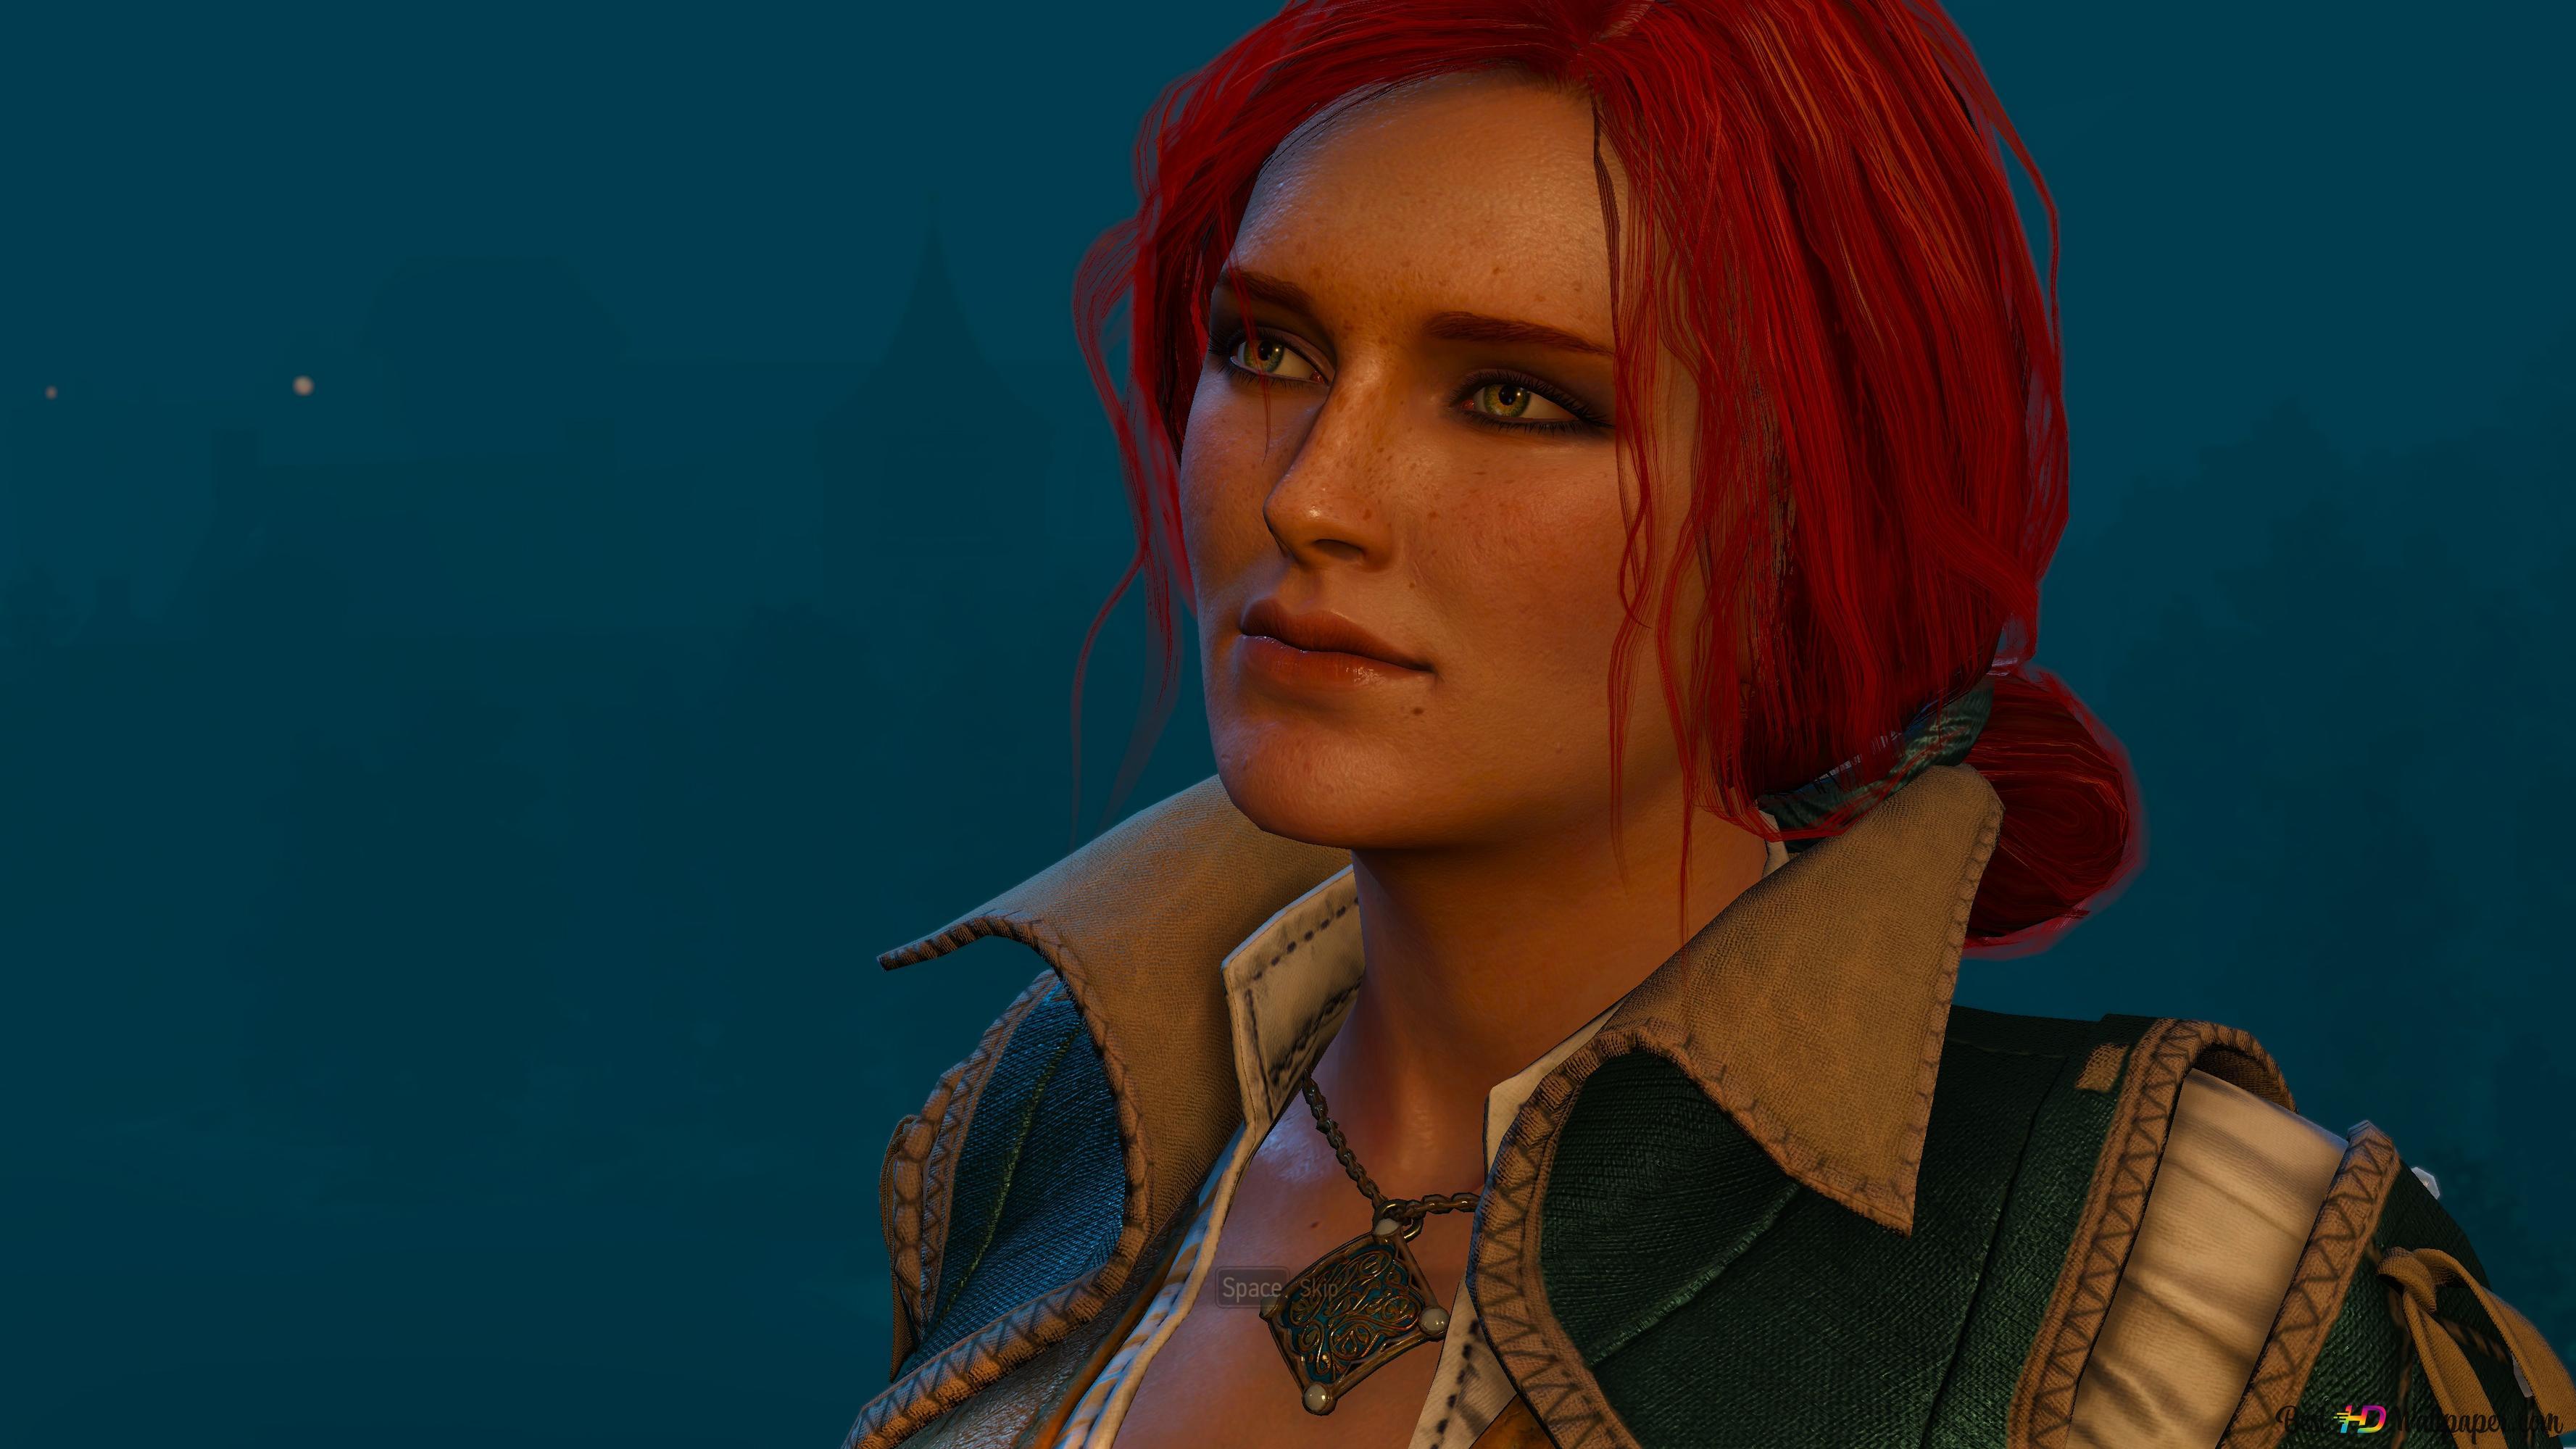 Descargar Fondo De Pantalla The Witcher 3 Wild Hunt Triss